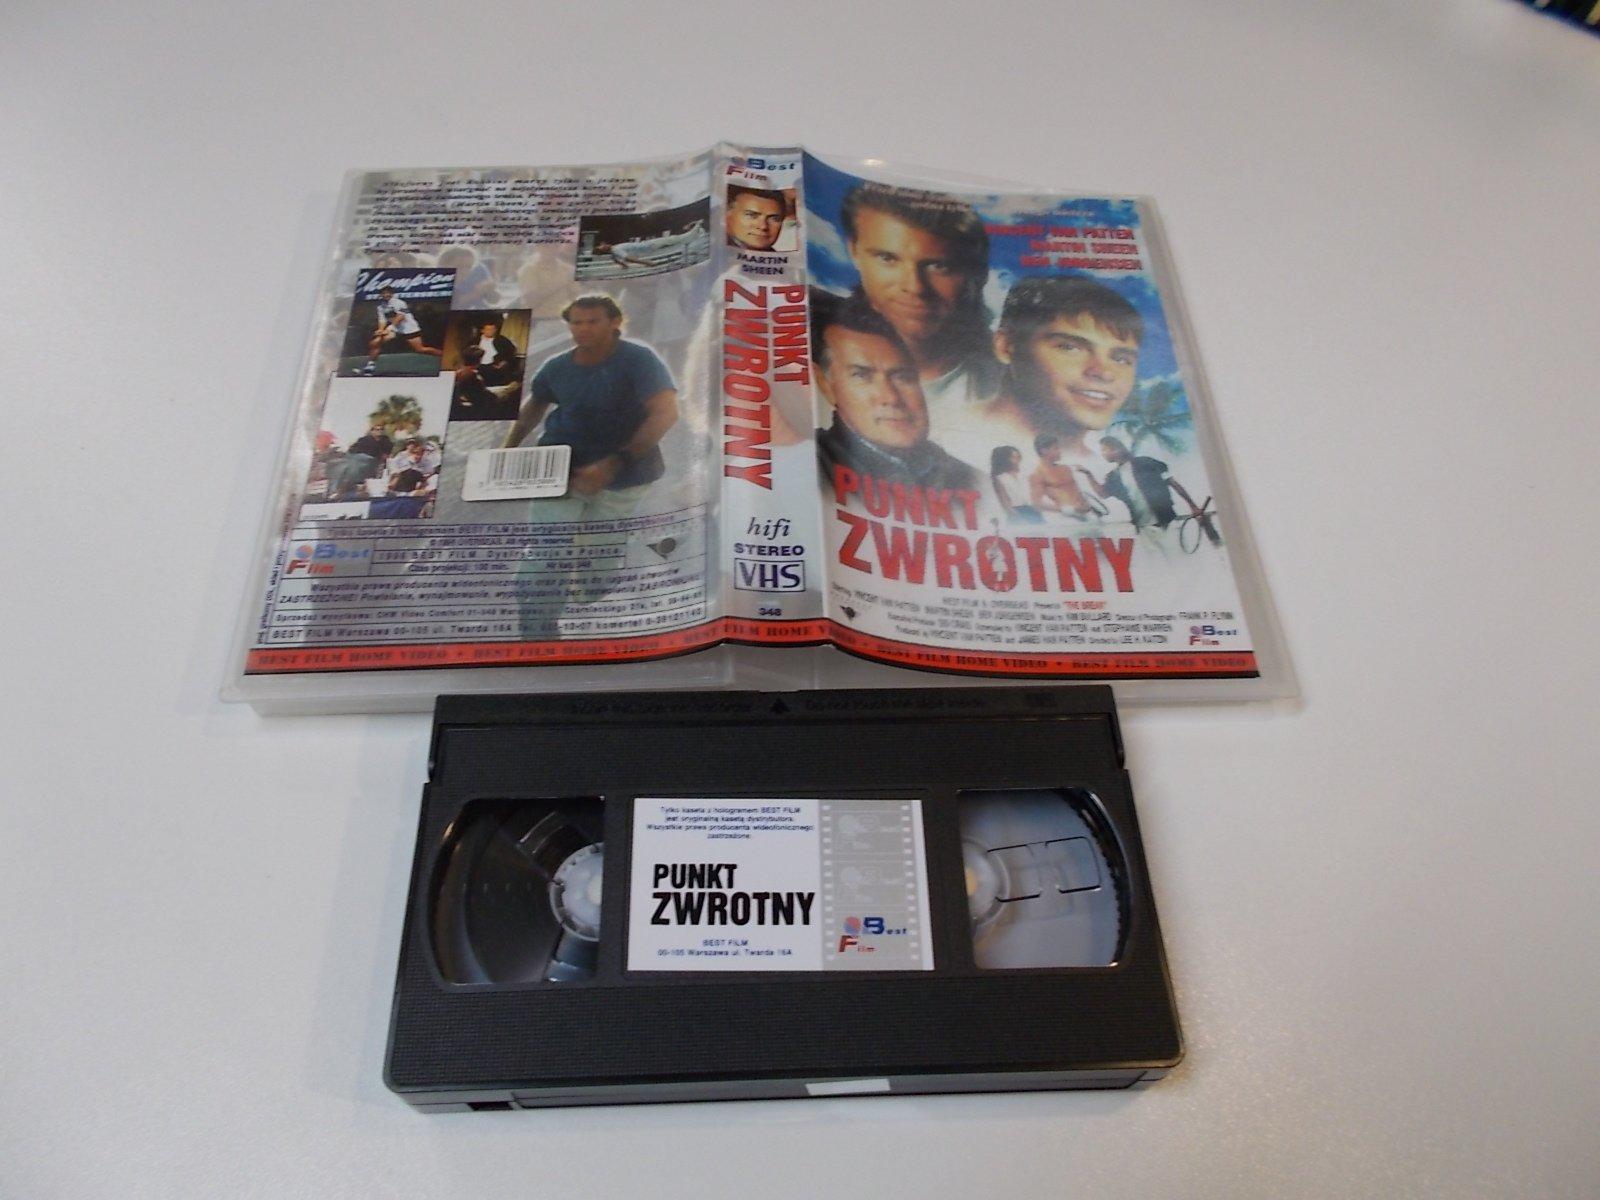 PUNKT ZWROTNY - VHS Kaseta Video - Opole 1690